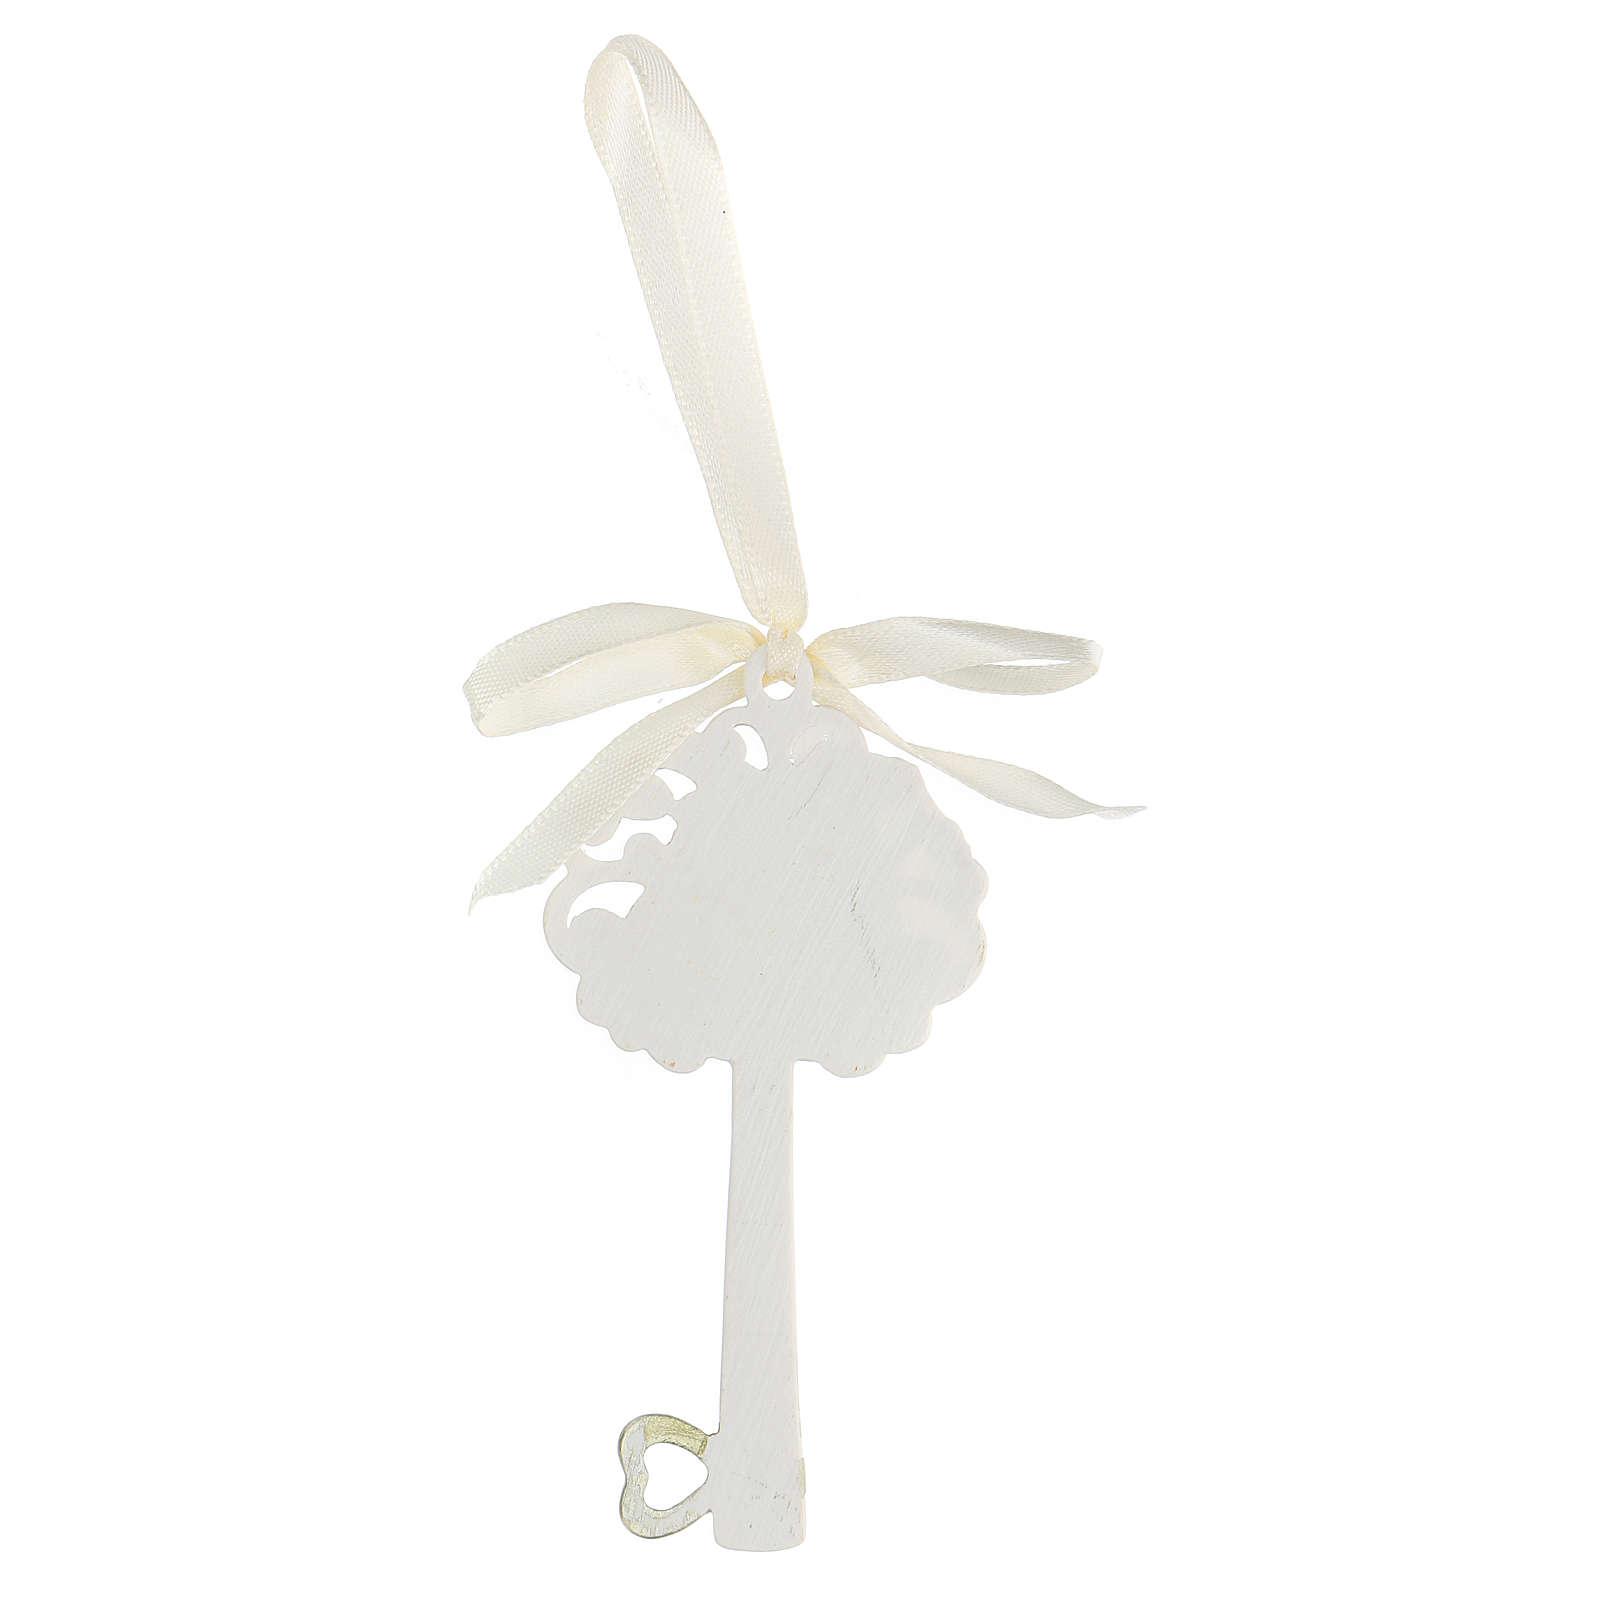 Recuerdo llave Sagrada Famiia resina 10 cm 3